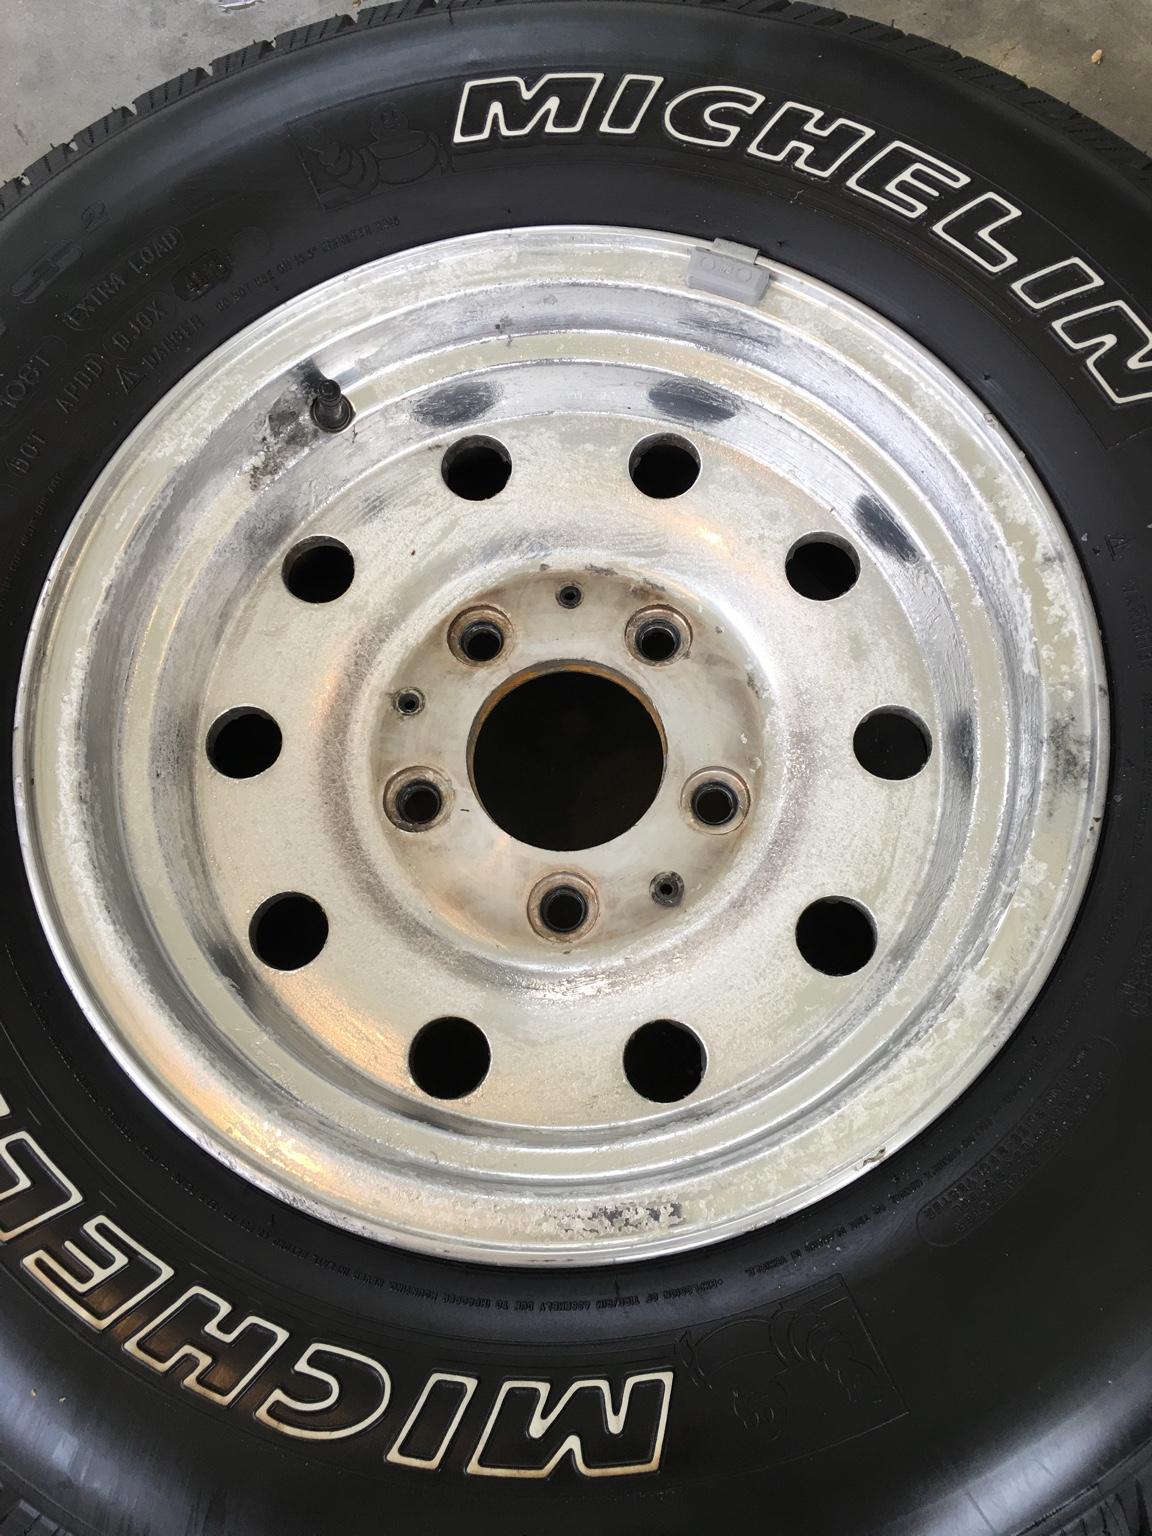 Wet Sanding Clear Coat >> Refinish aluminum bullet hole rims - Ford F150 Forum